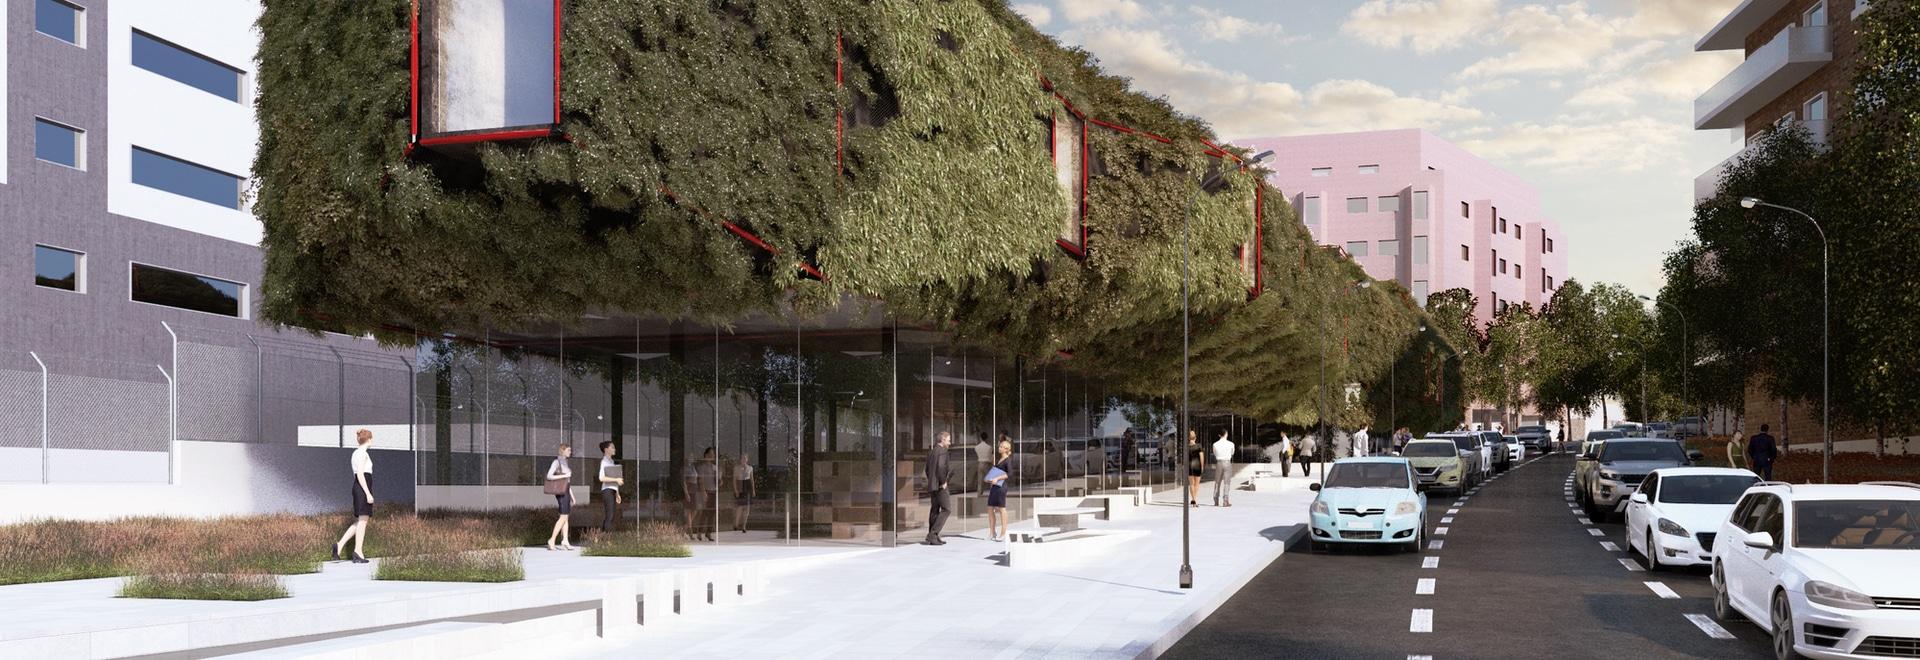 Astronave spaziale verde: Biblioteca Vegetata per atterrare a Villaverde di Madrid